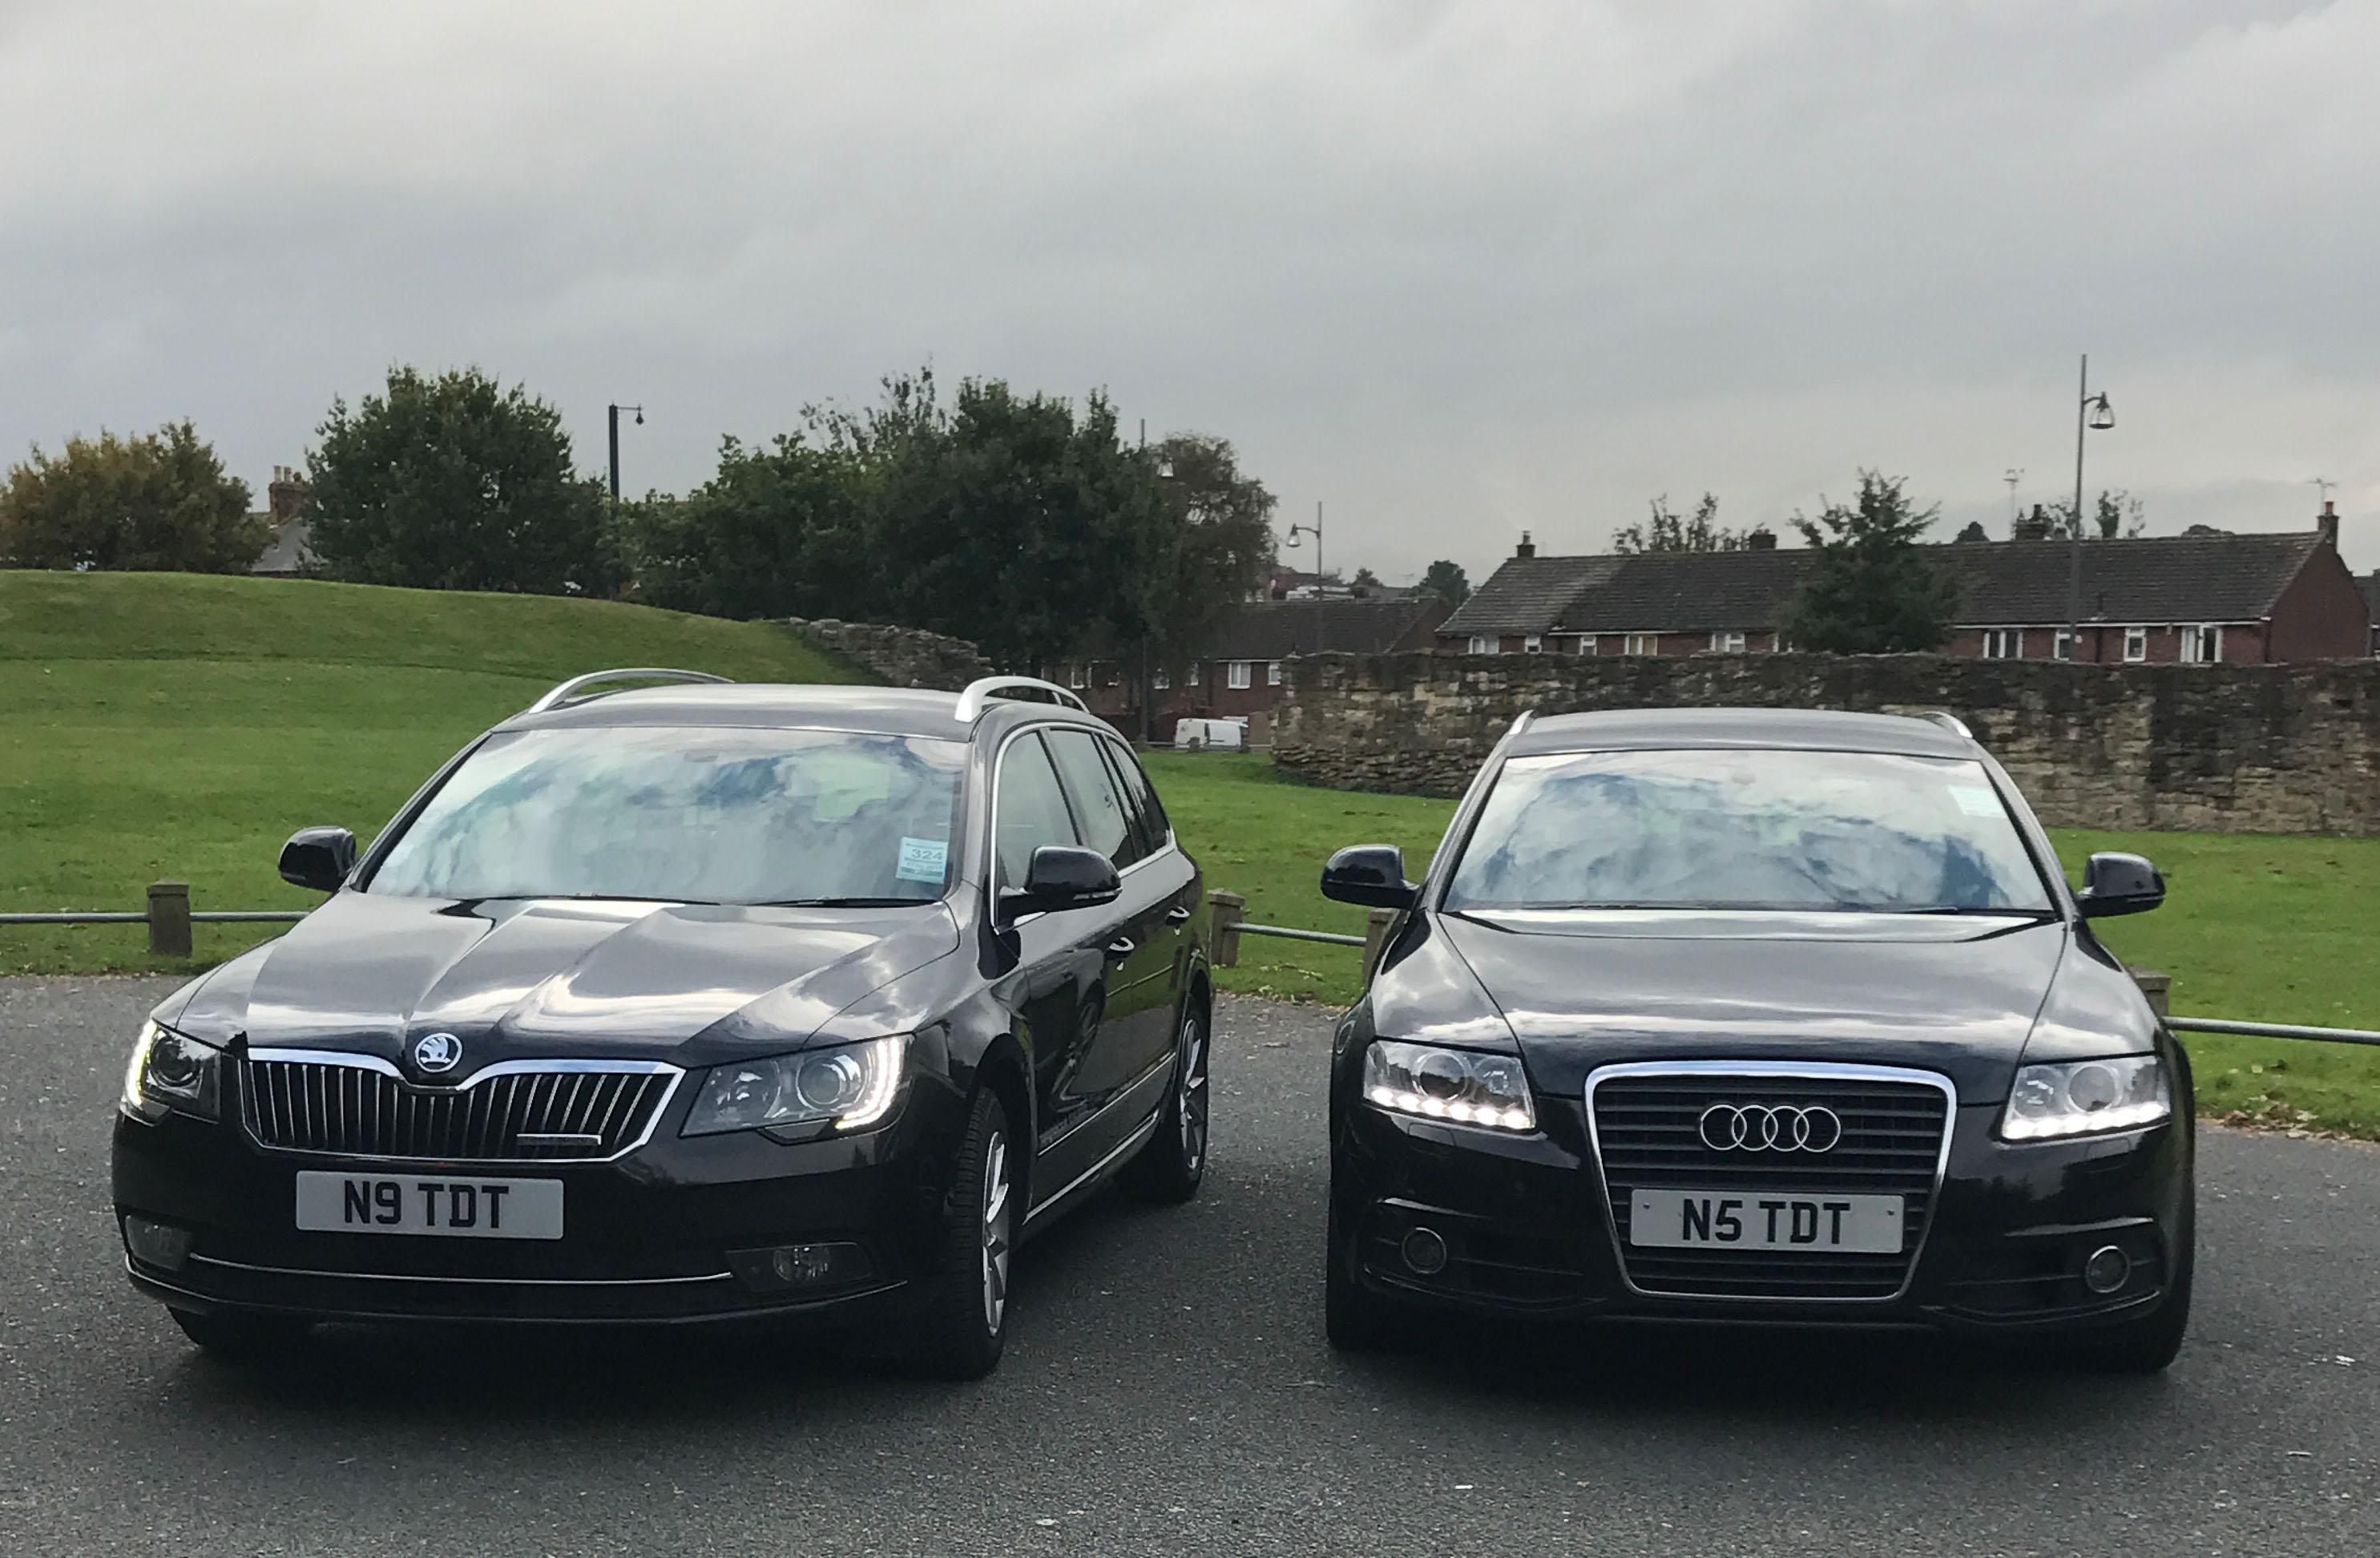 Airport Taxi Transfers Caernarfon